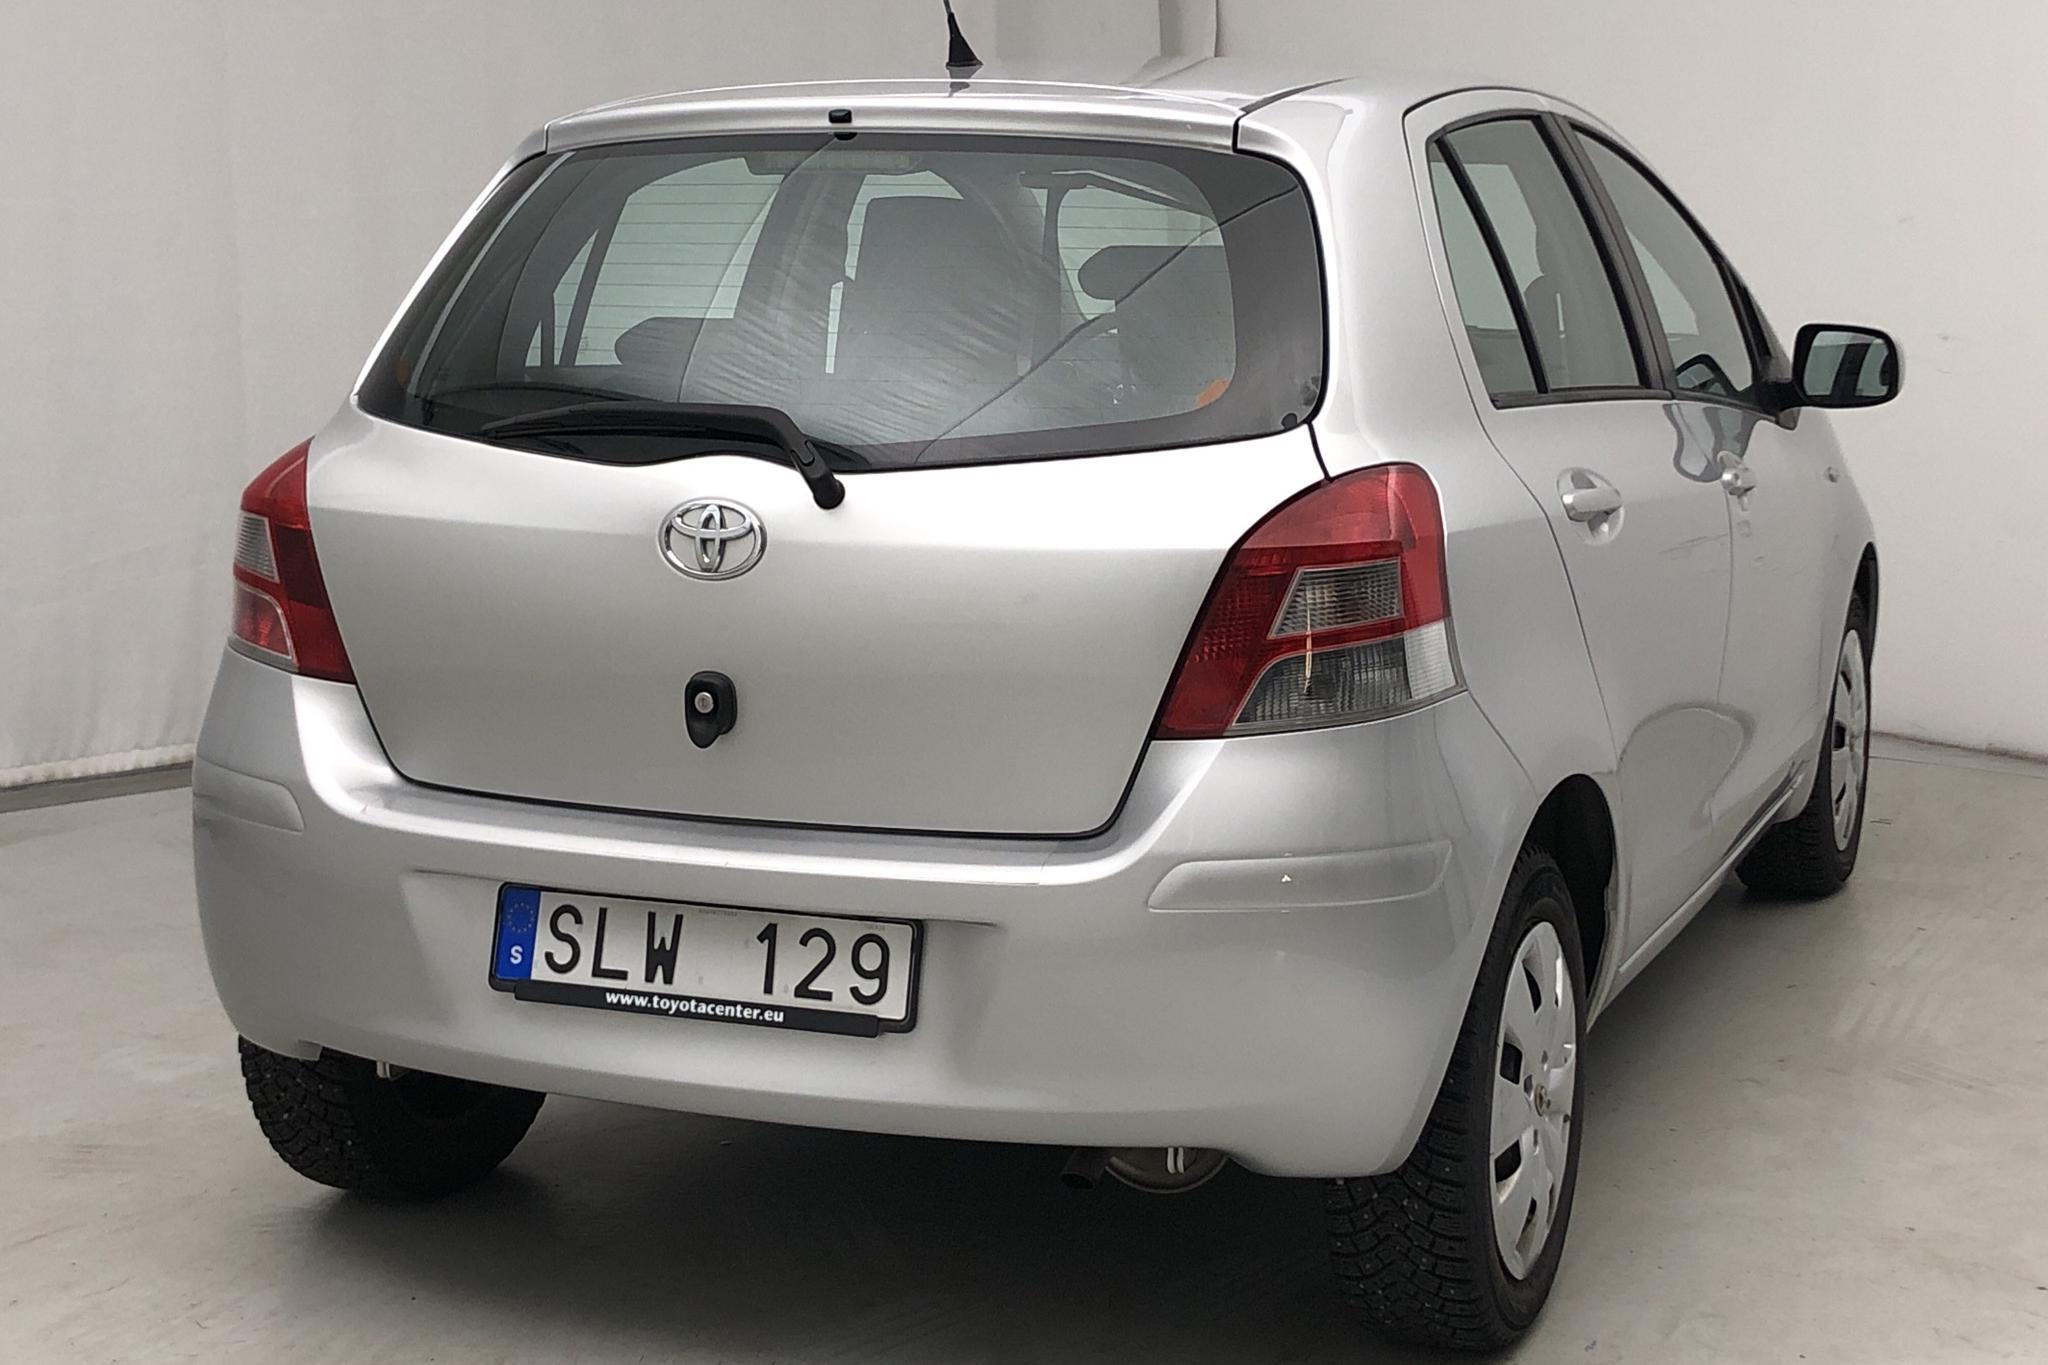 Toyota Yaris 1.0 5dr (69hk) - 9 934 mil - Manuell - silver - 2010